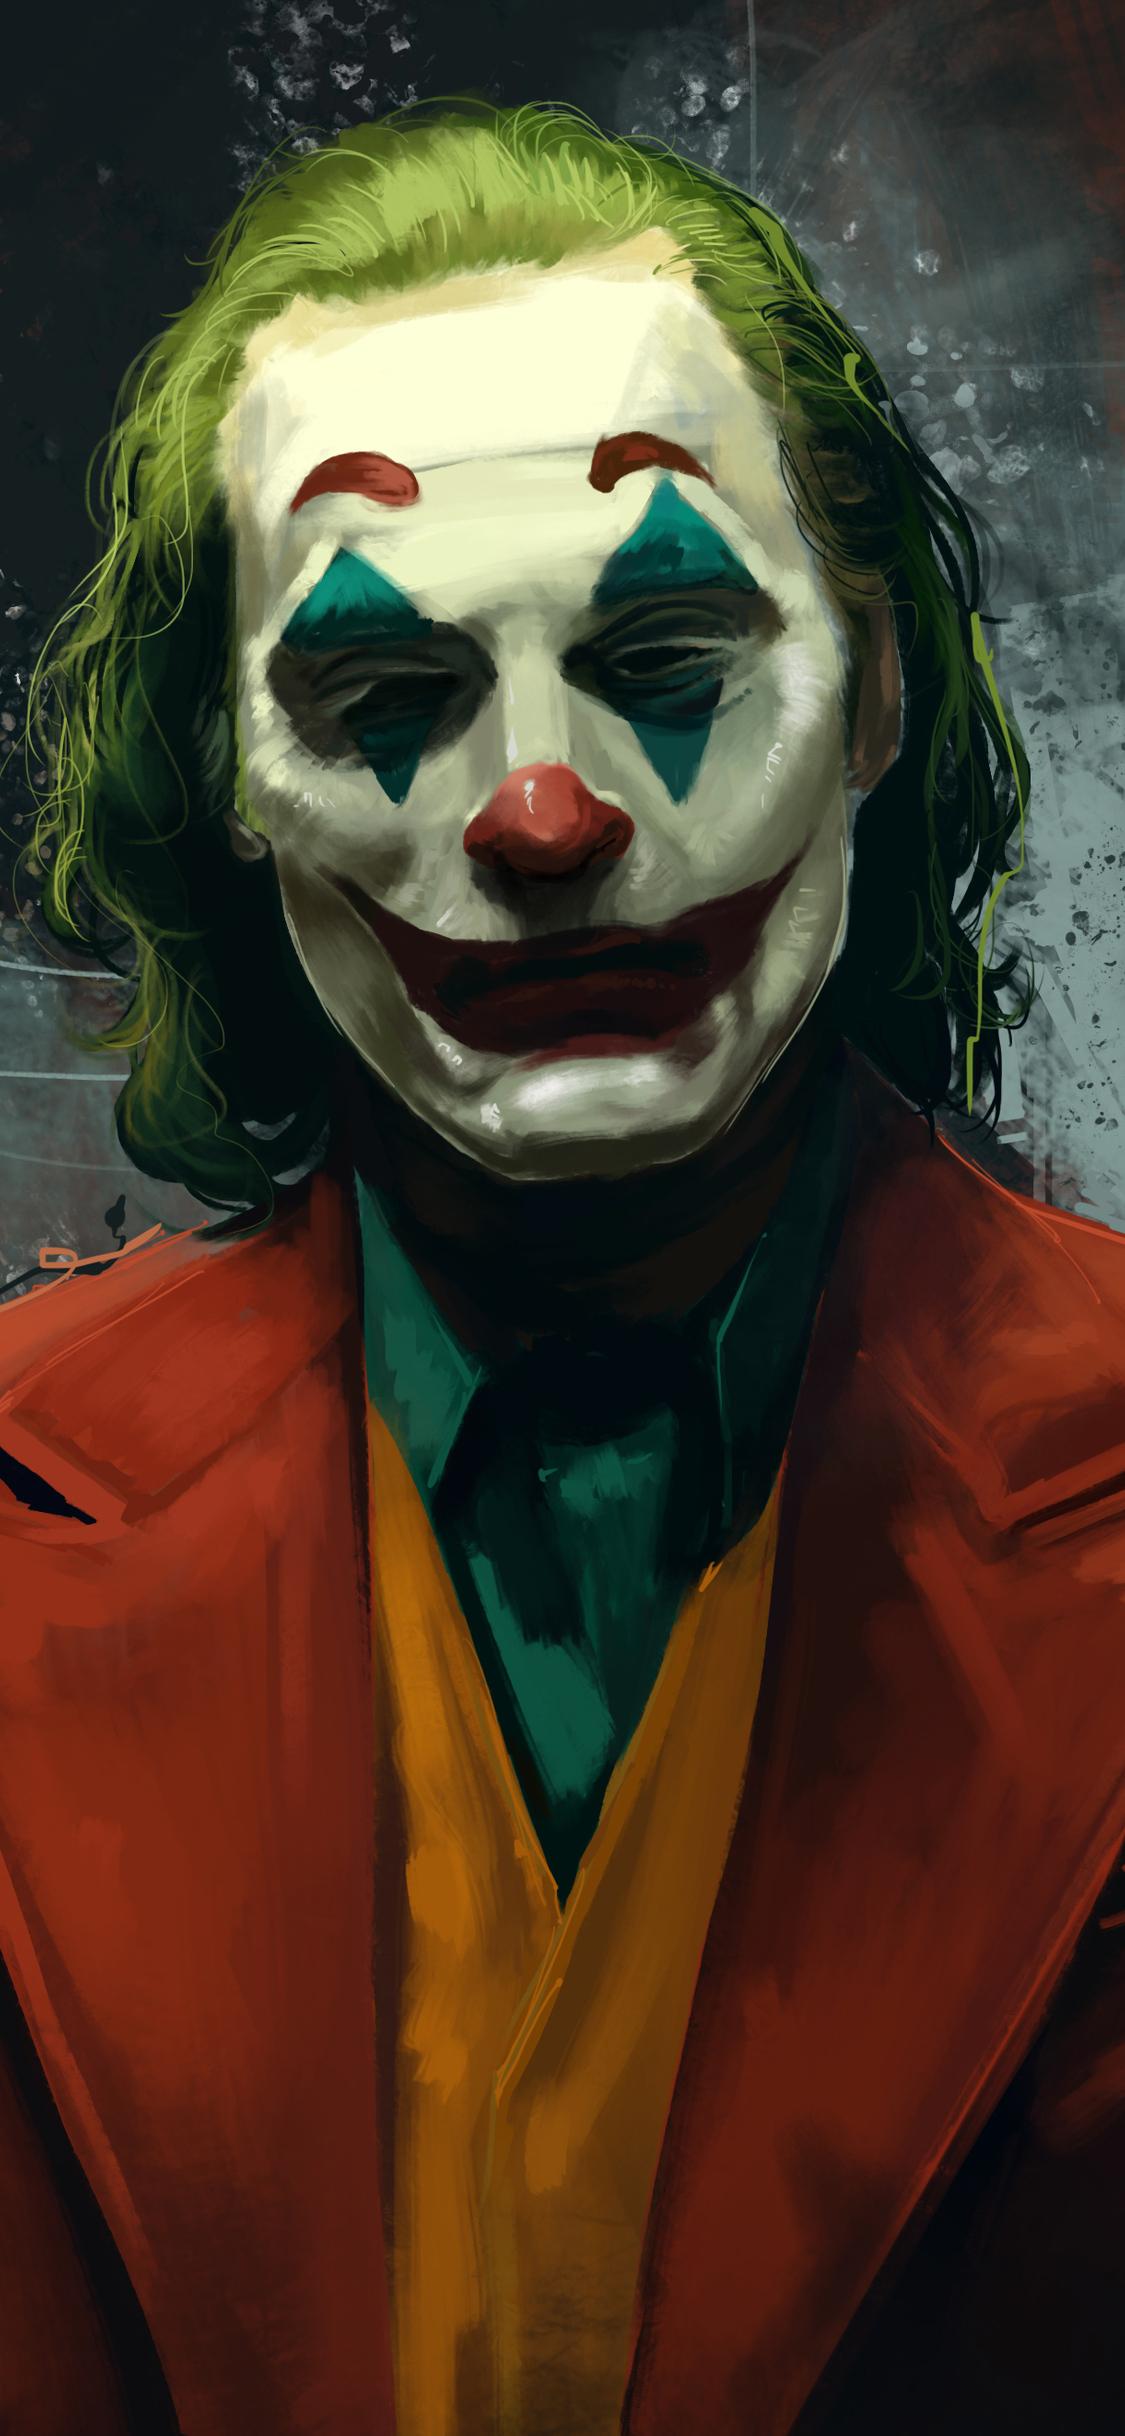 1125x2436 Joker Joaquin Phoenix Movie Artwork Iphone Xs